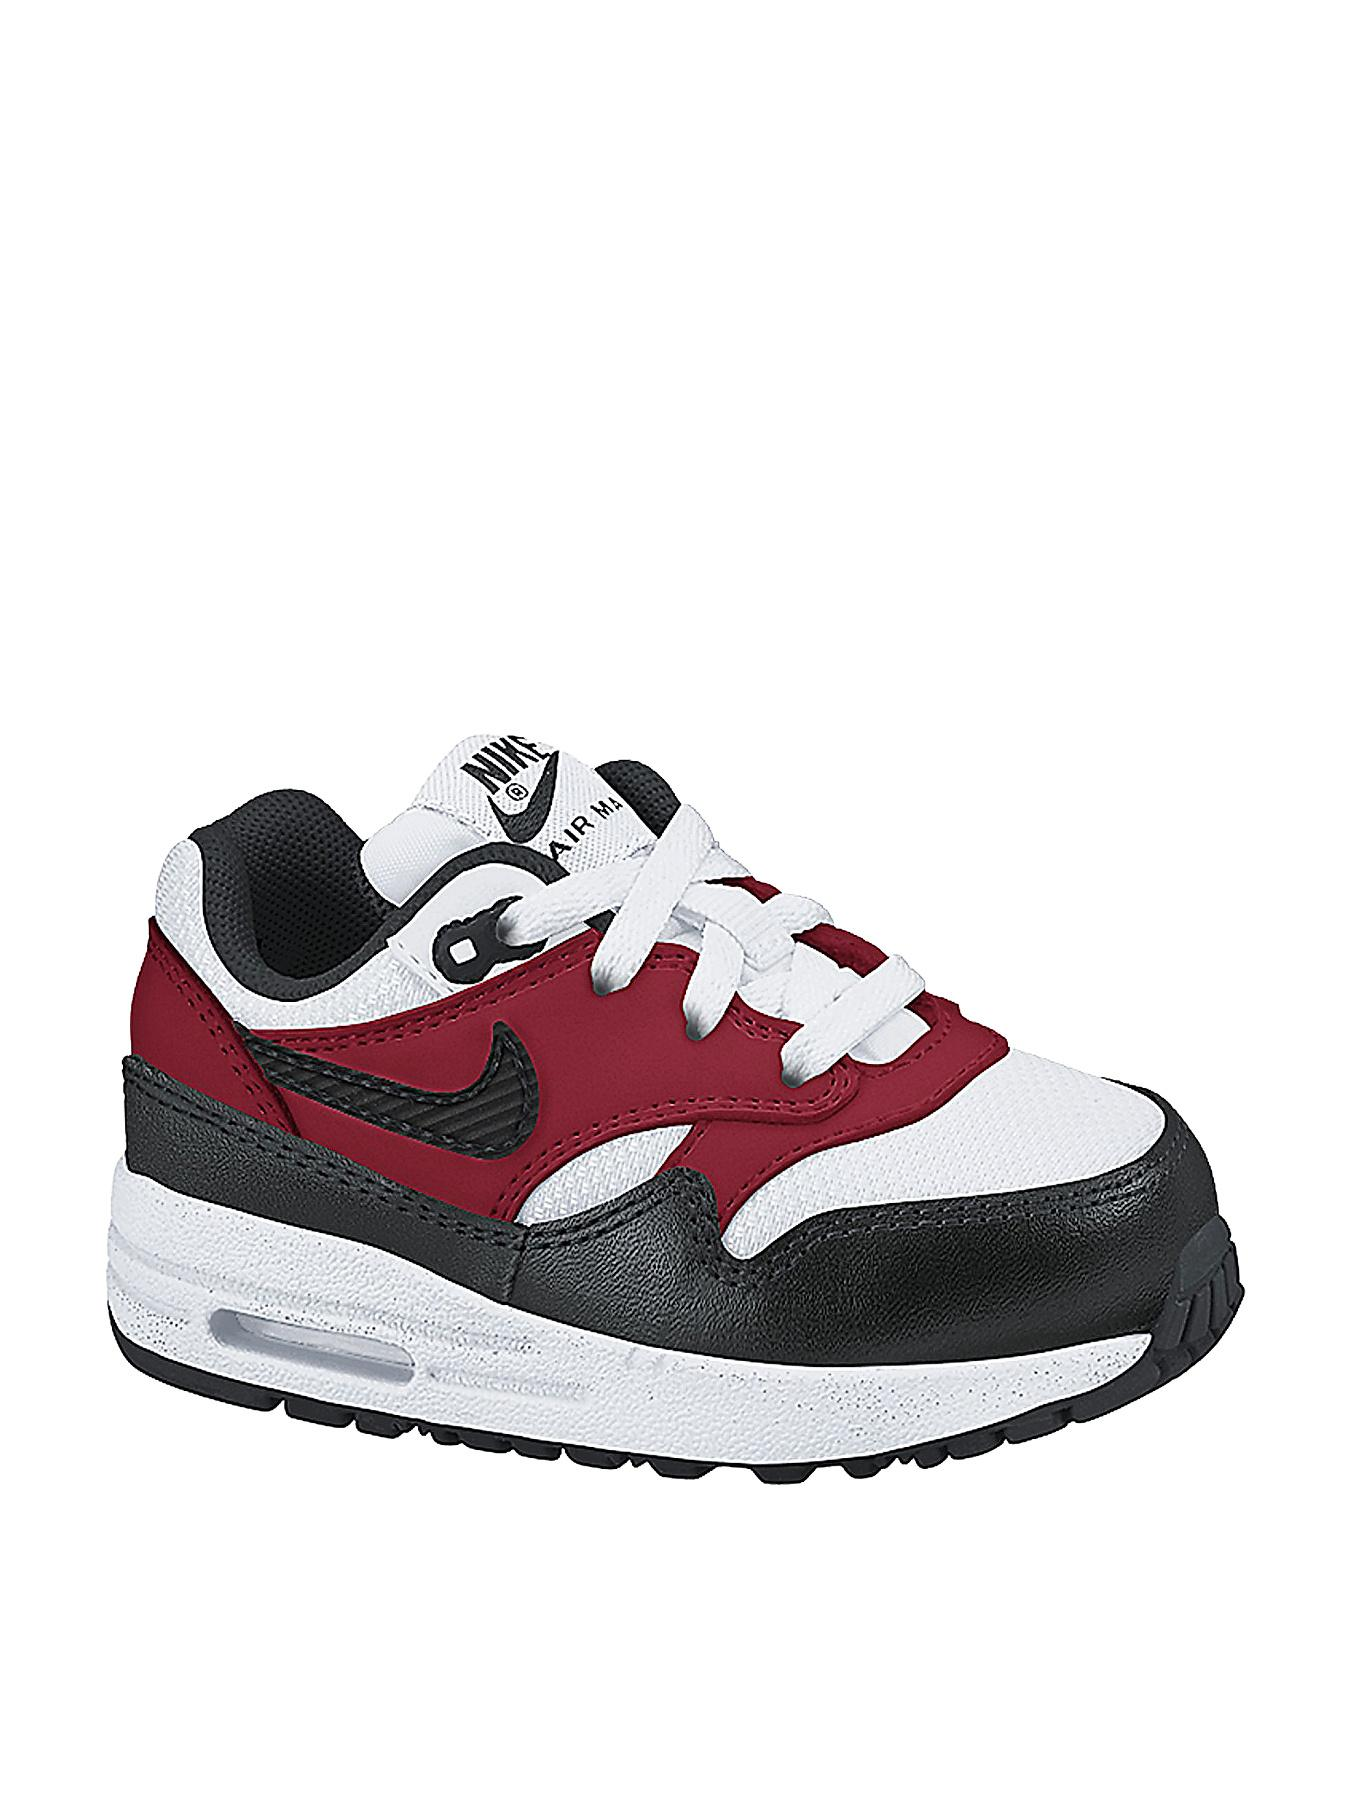 Nike Air Max 1 Trainers - White, White